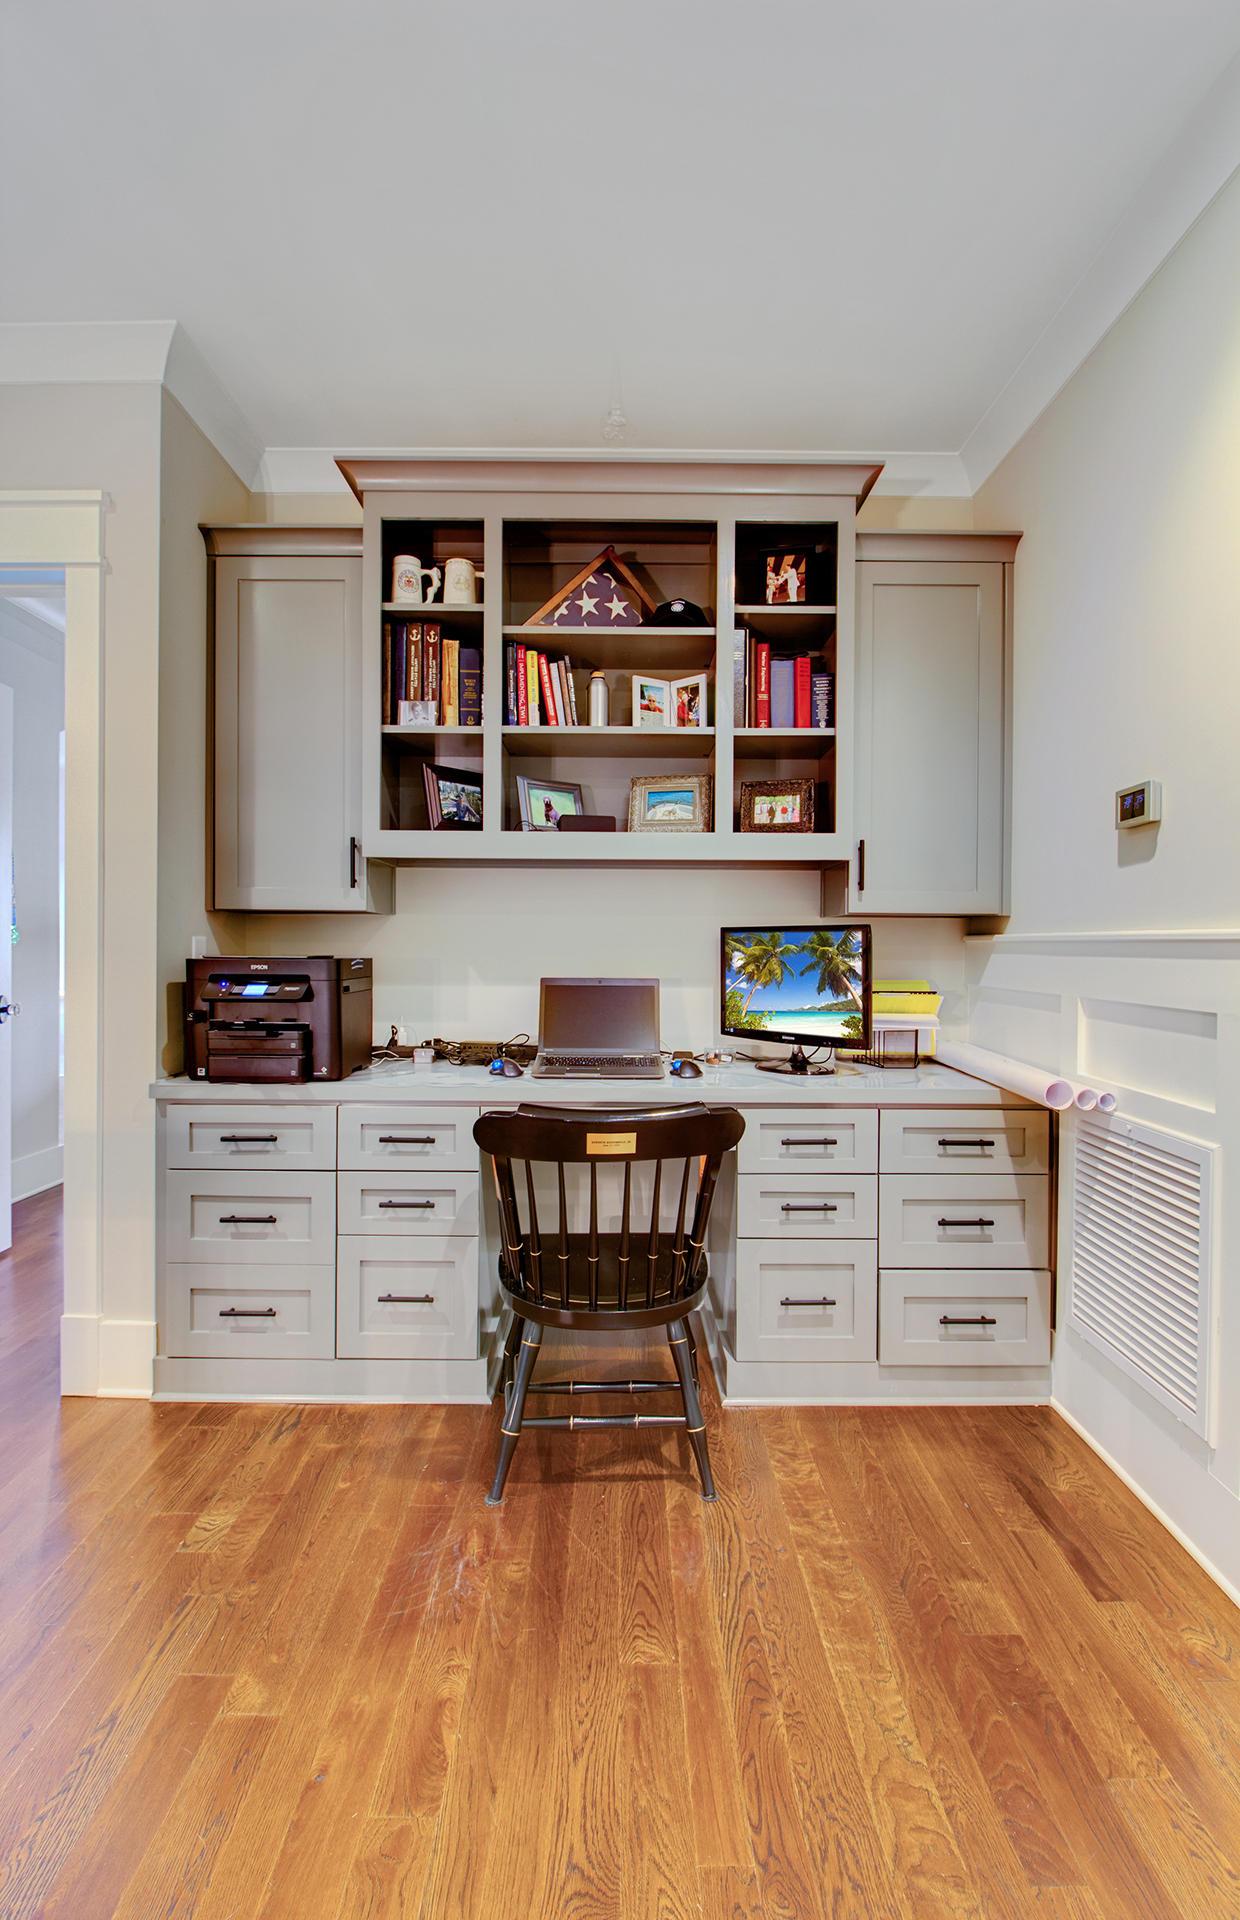 Daniel Island Park Homes For Sale - 117 Brailsford, Charleston, SC - 63